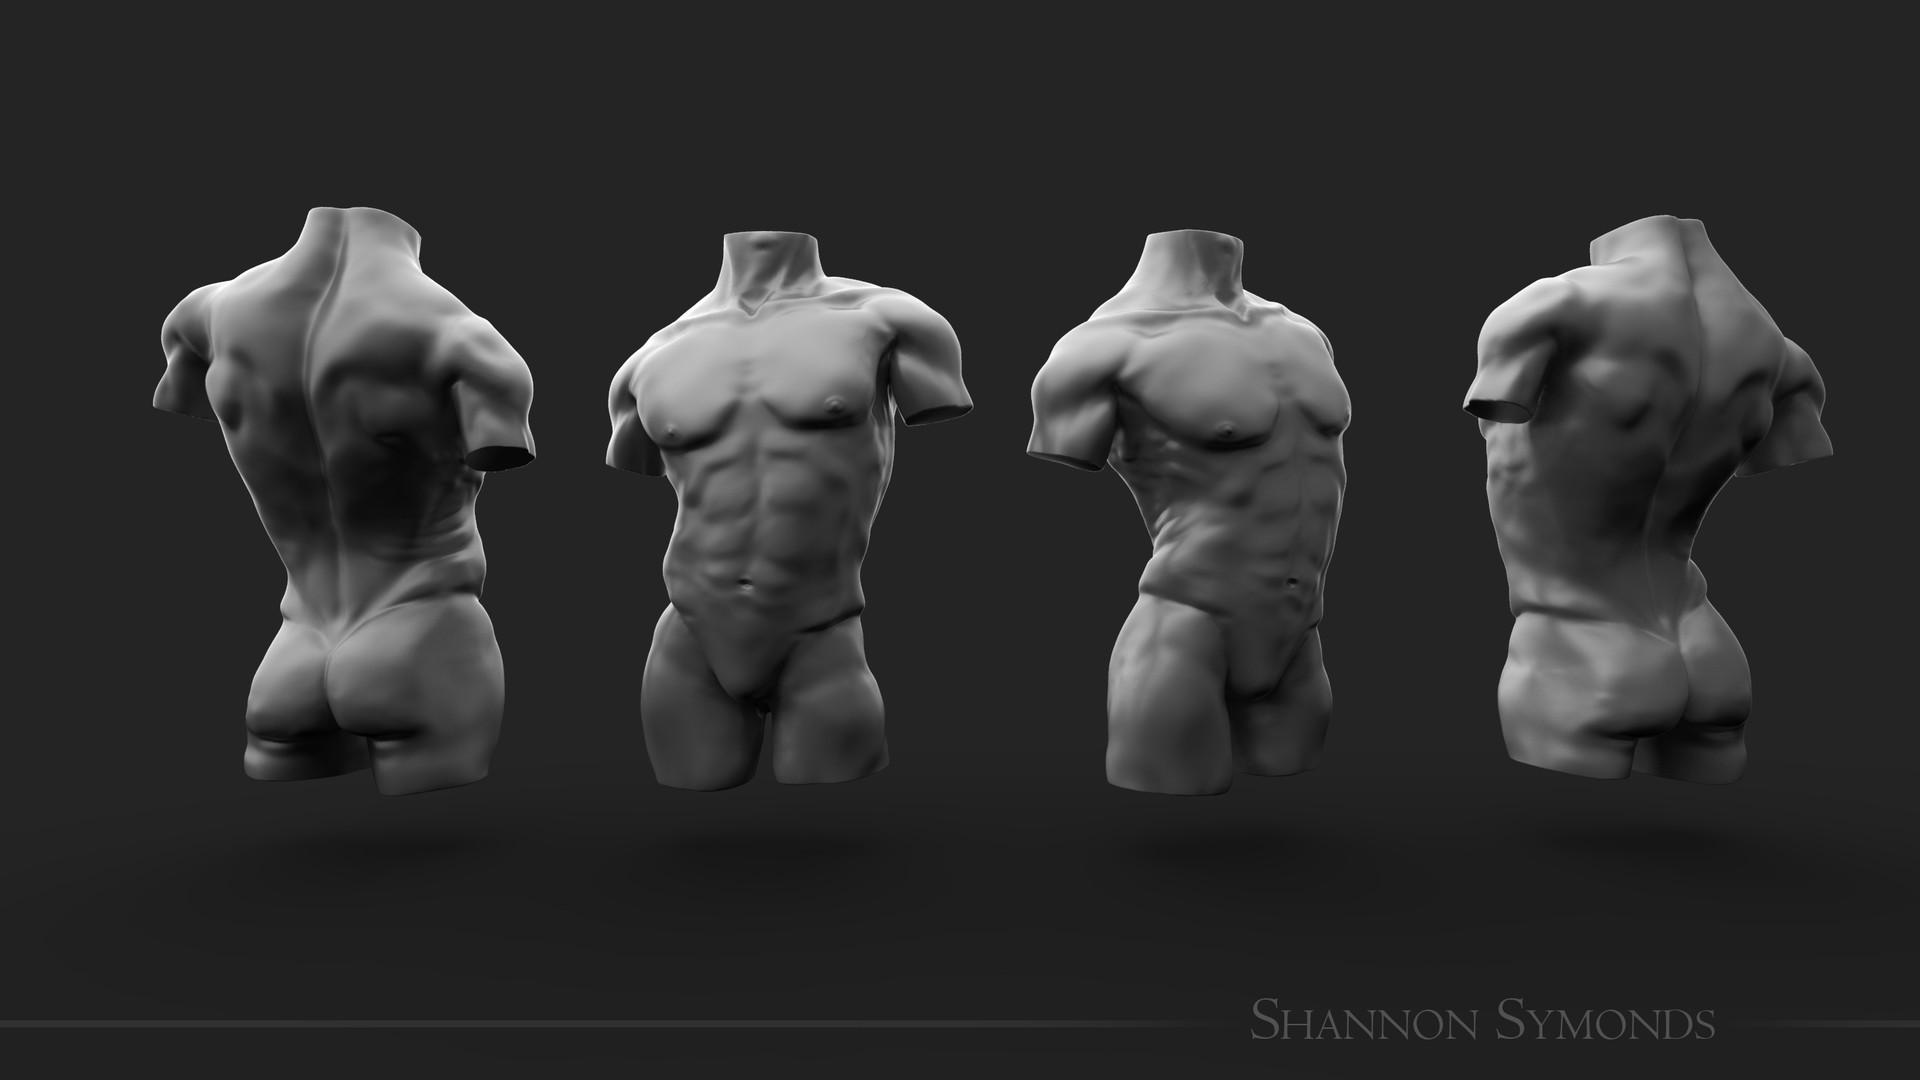 Shannon symonds male torso twist 75